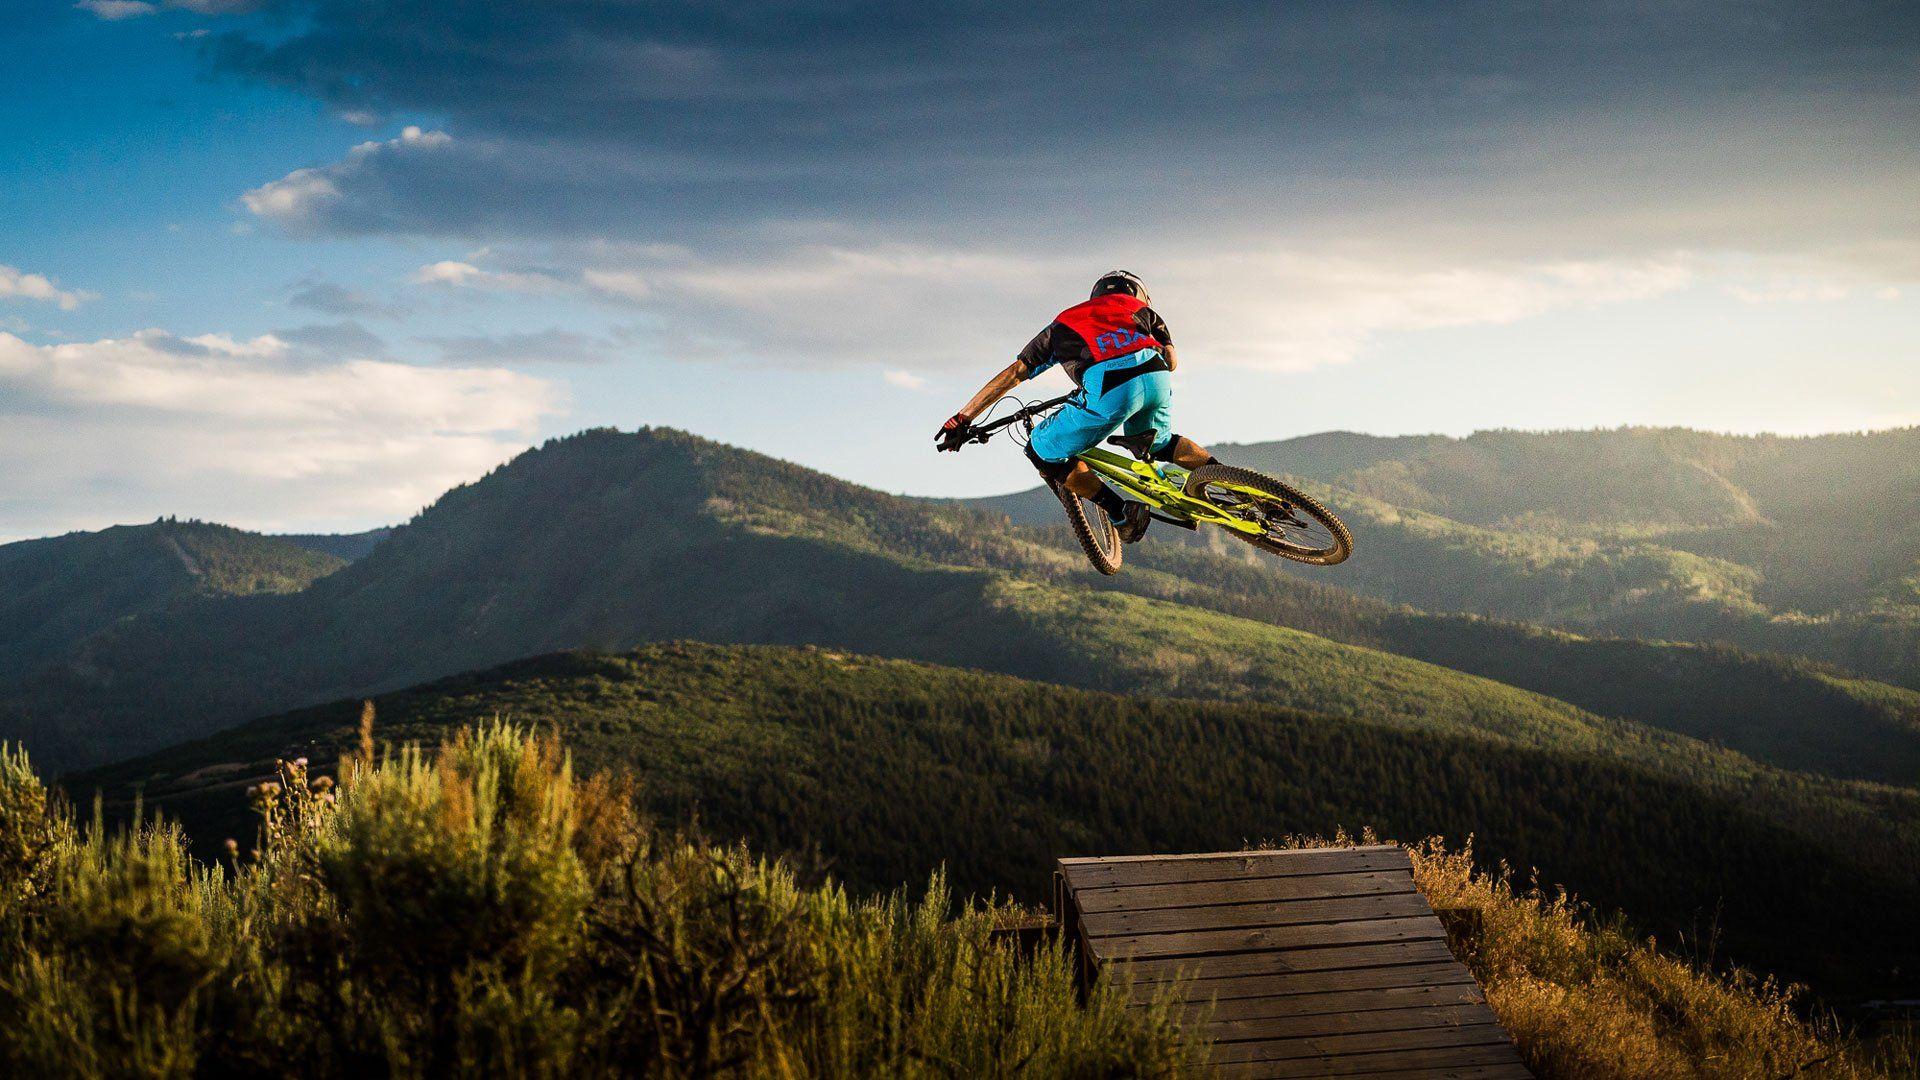 Mountain Bike desktop wallpaper download